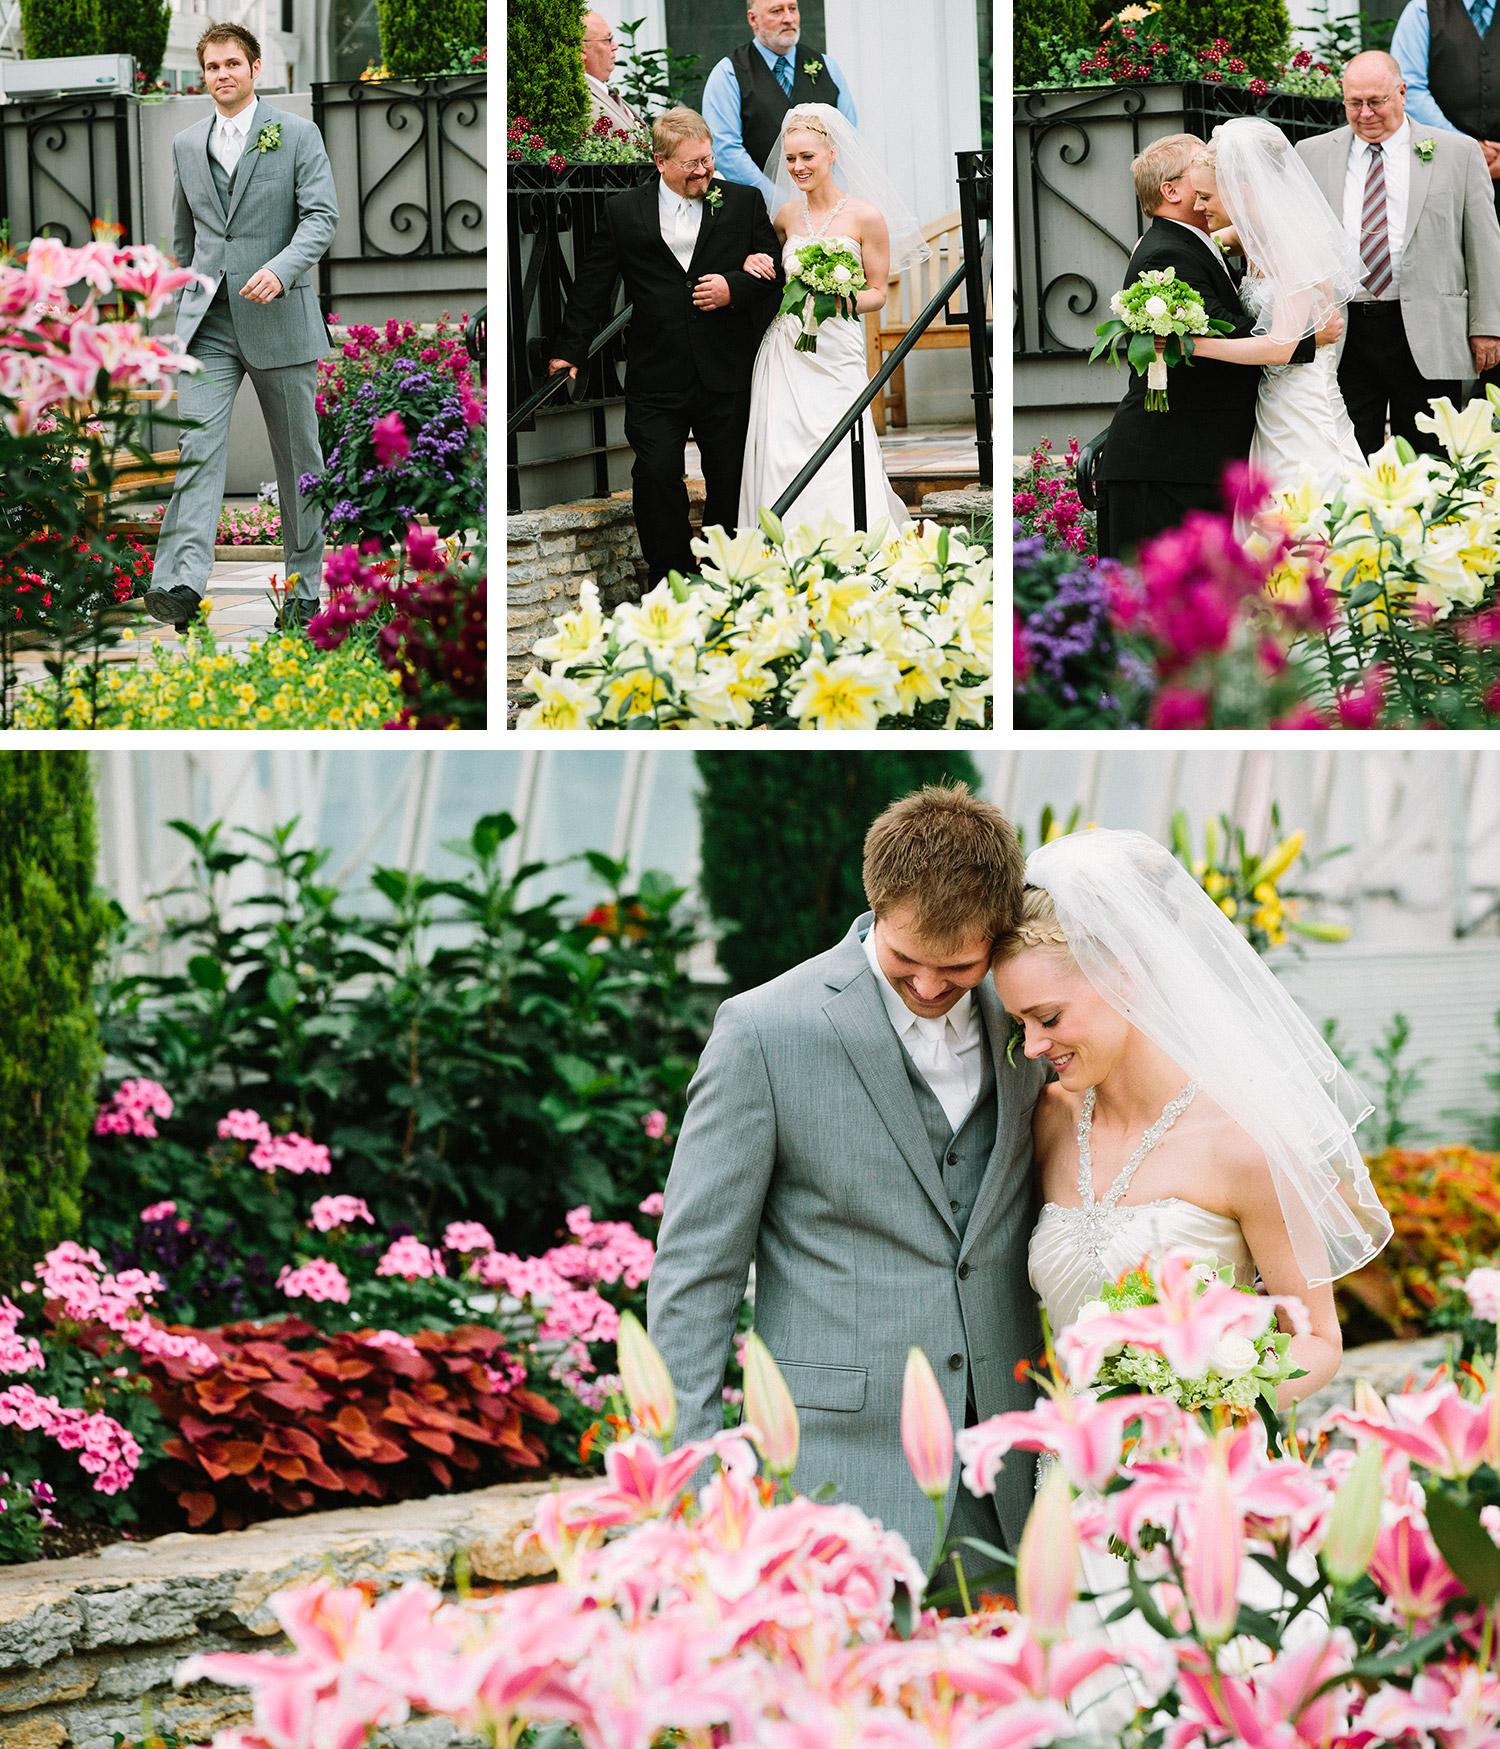 15_Saint_Paul_Hotel_Landmark_Center_wedding.jpg